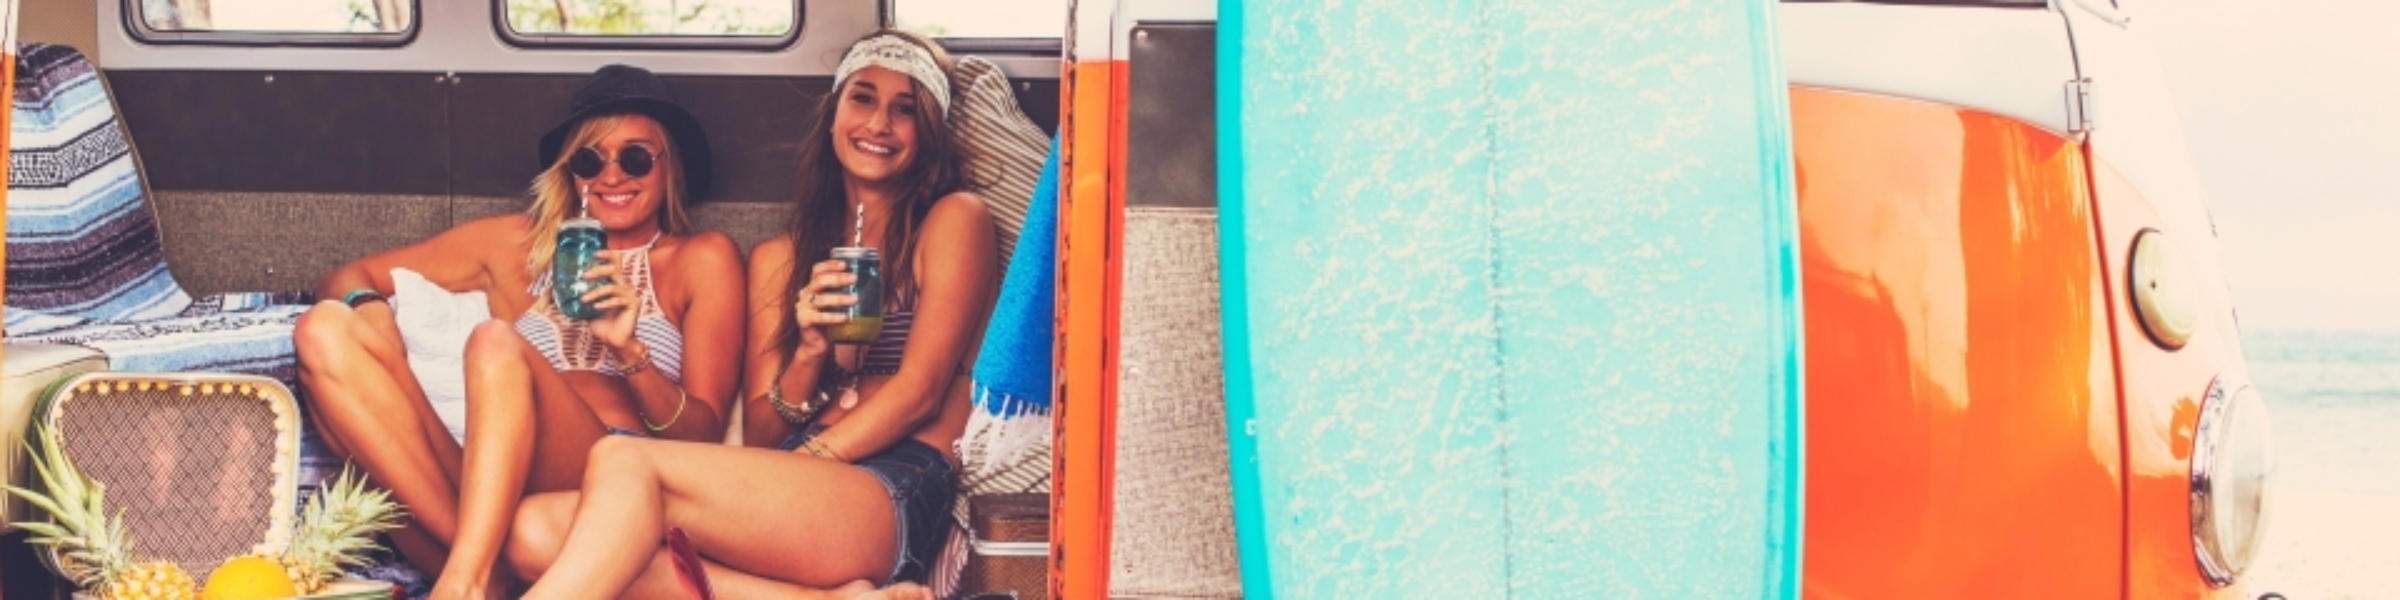 Surf-Board-Beach-VW-Van-Girls-960x300_c